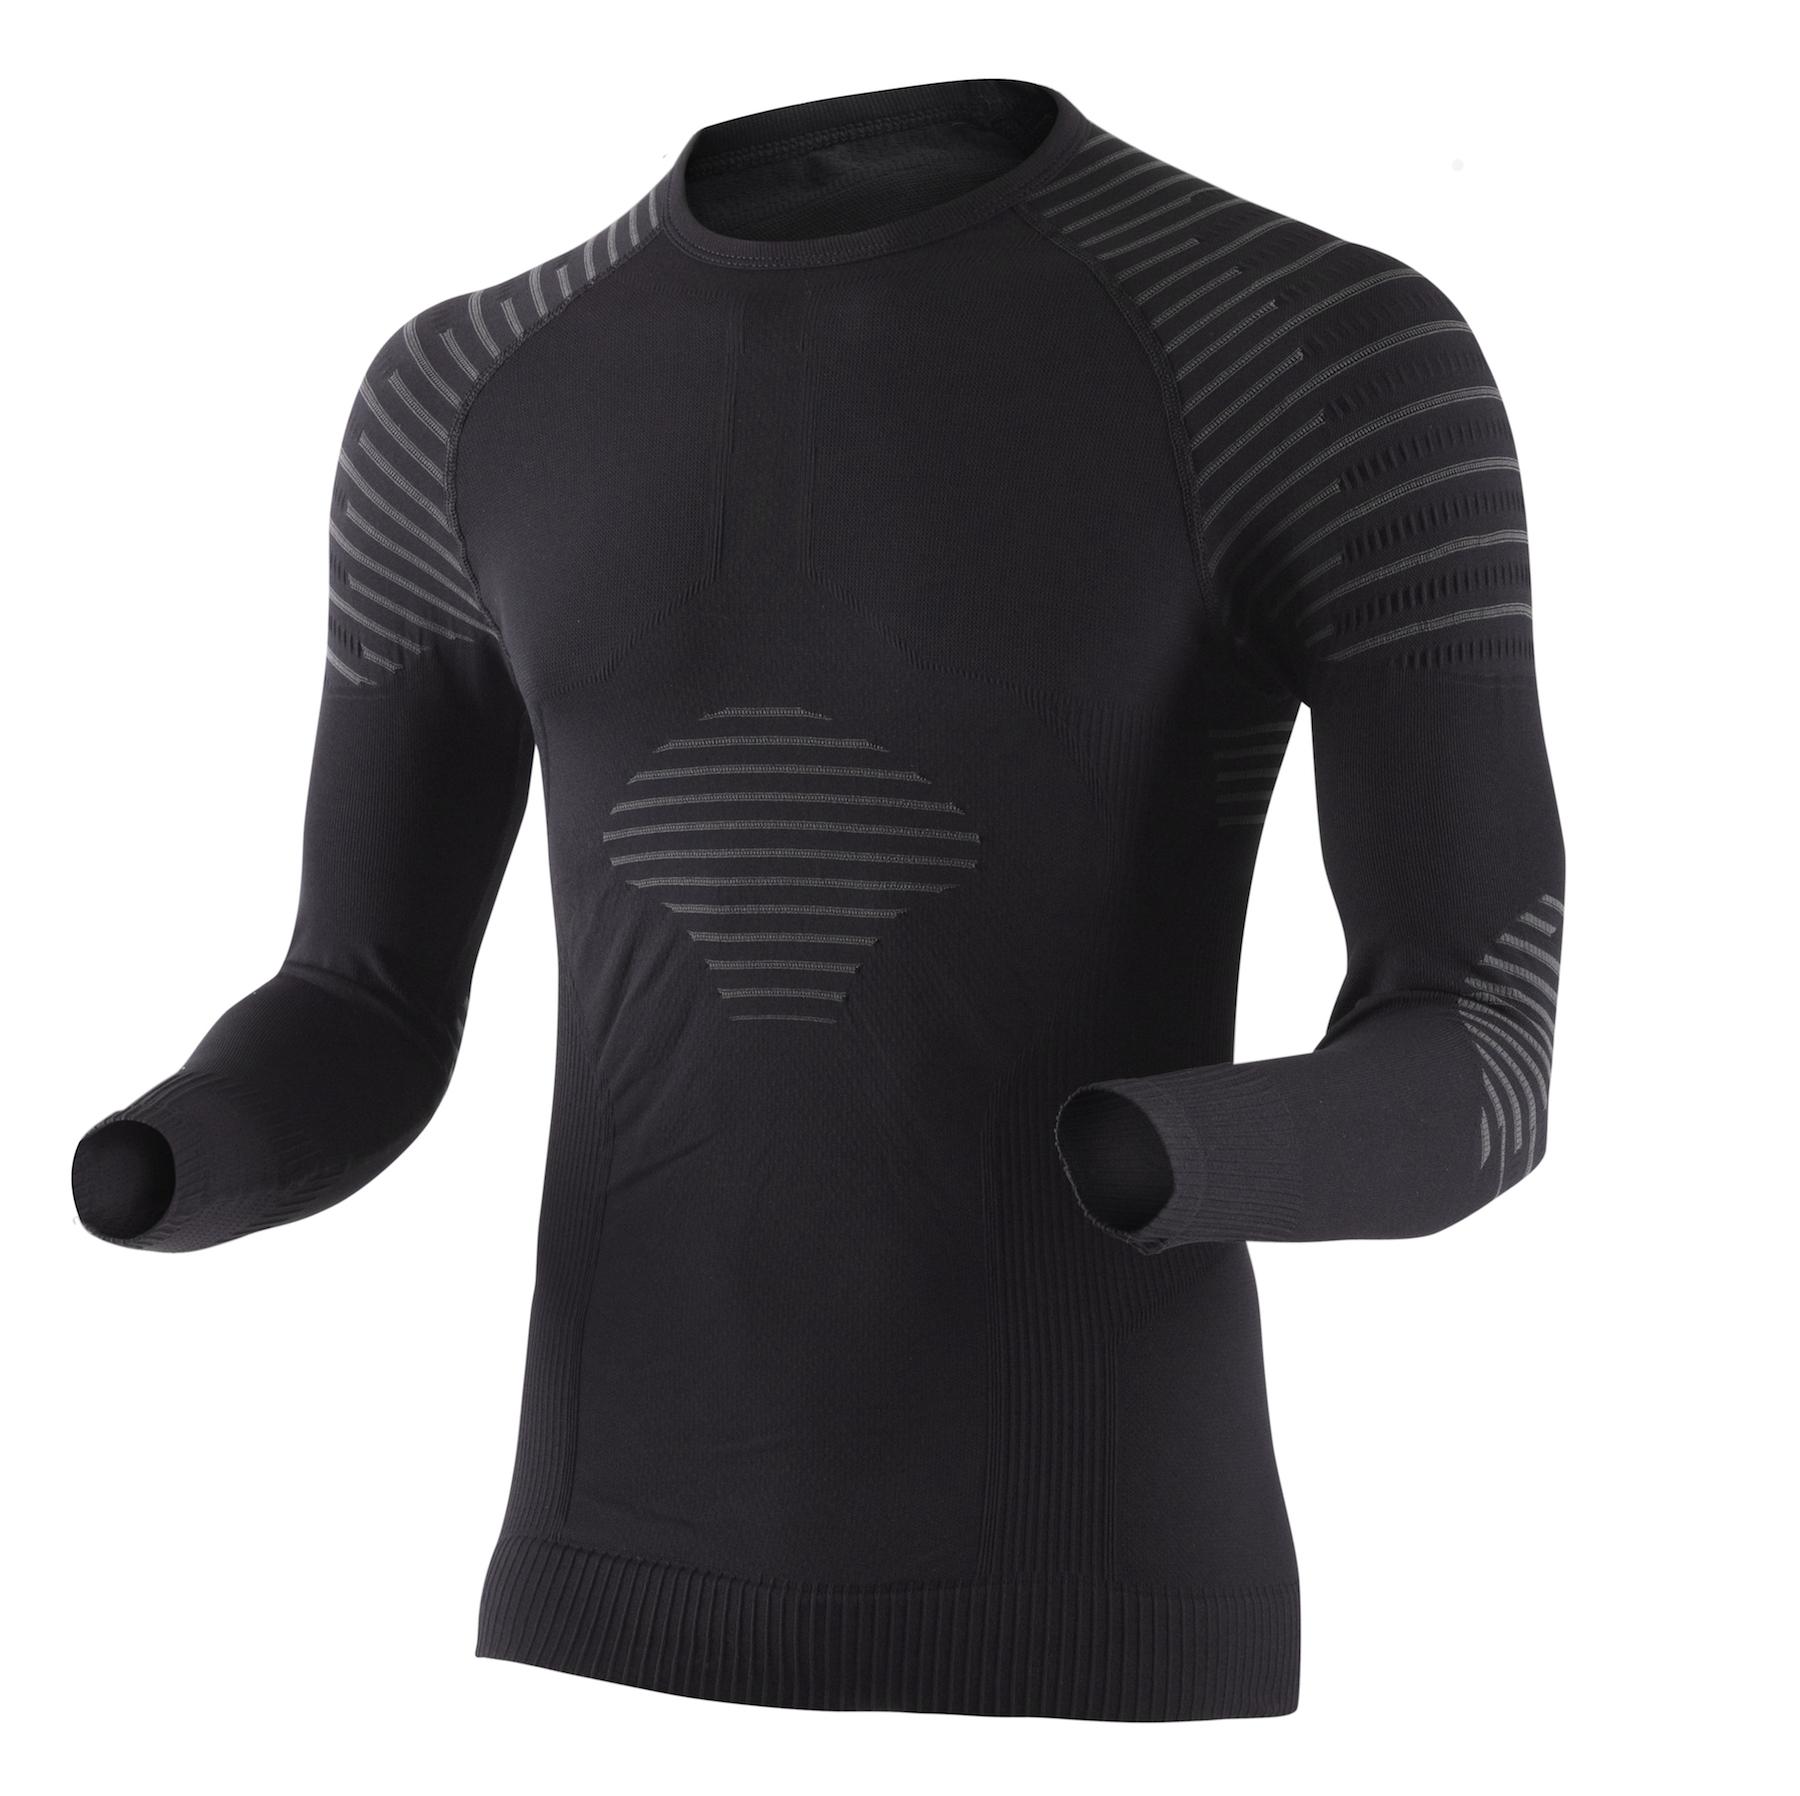 X-Bionic Invent Shirt long sleeves - Funktionsshirt - Herren